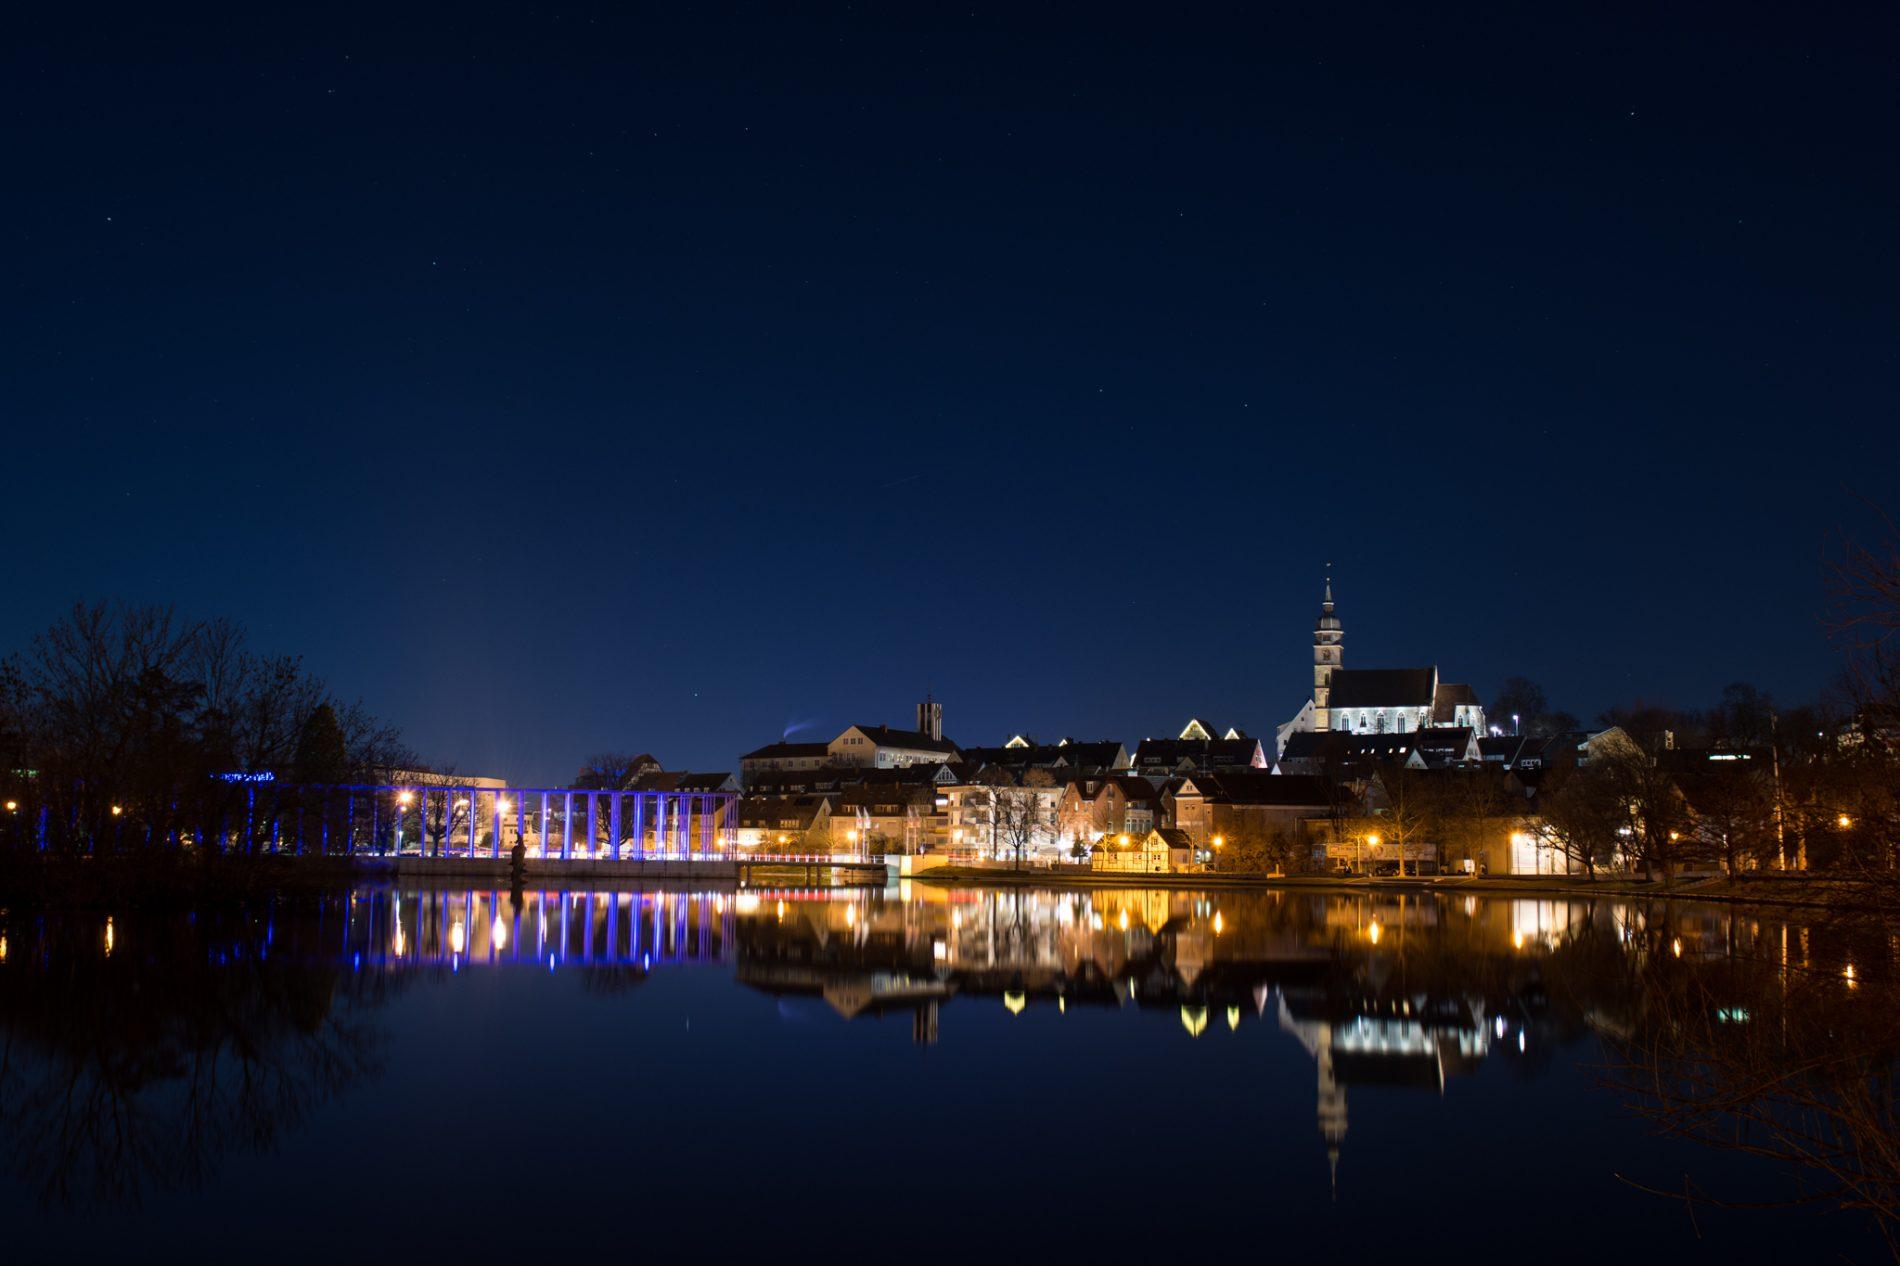 Böblingen, See, Nacht